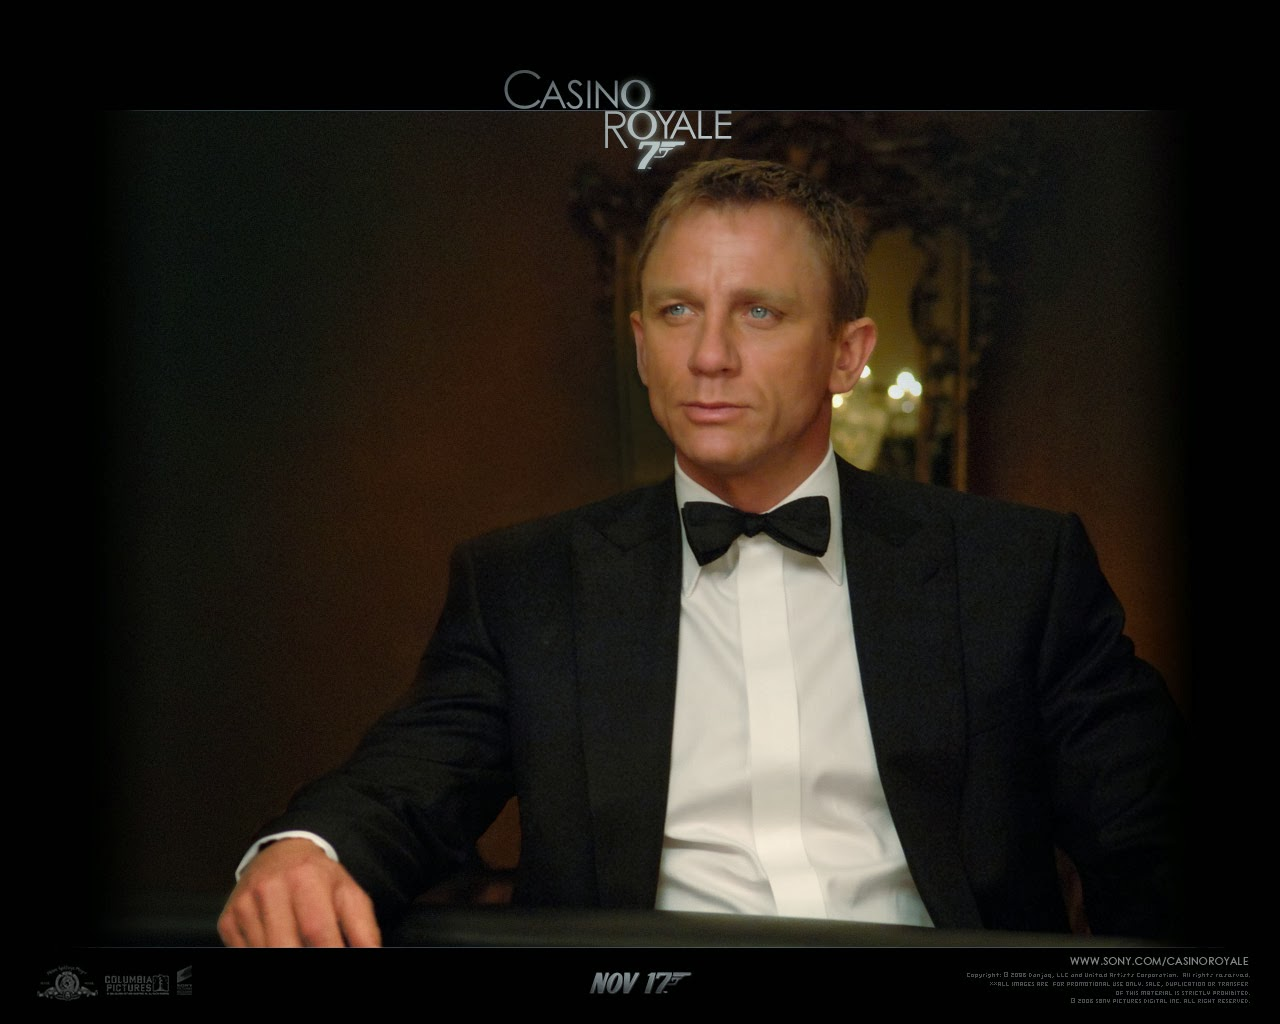 007 casino royale daniel craig